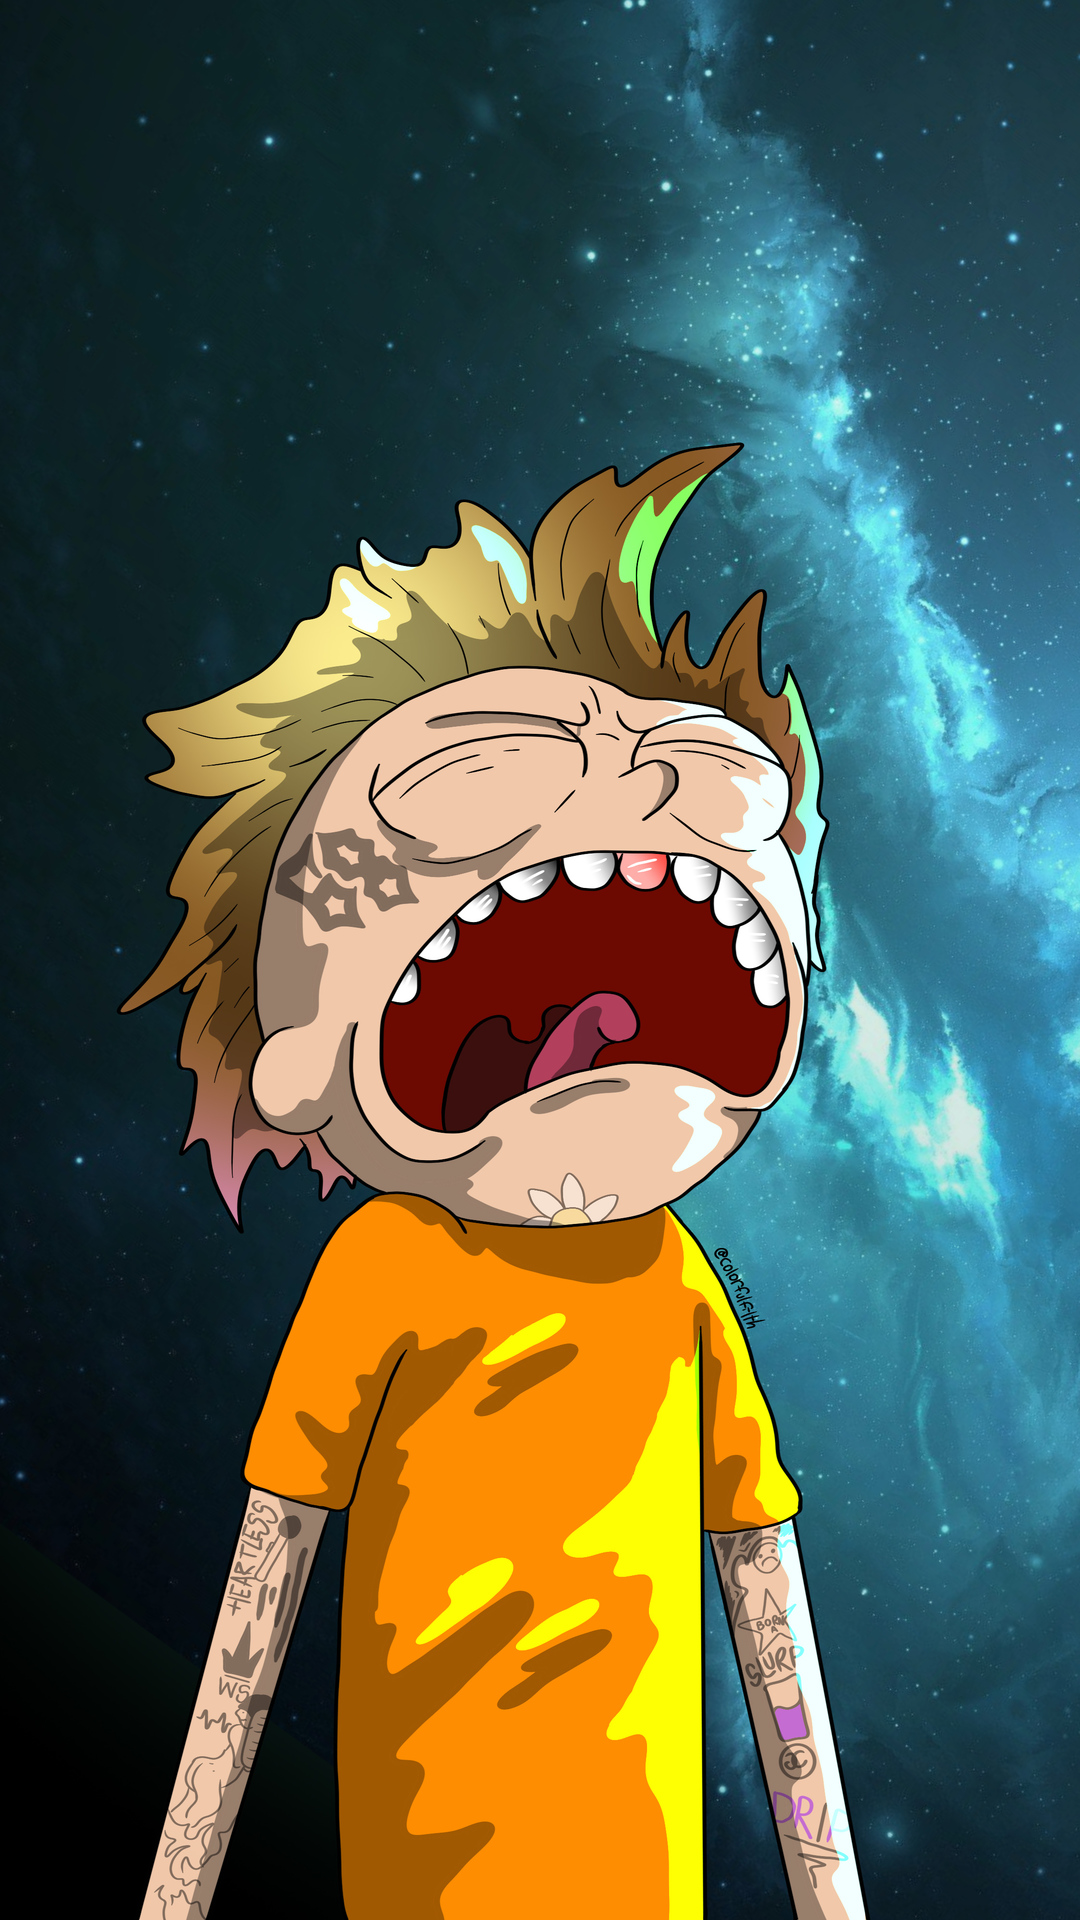 Crying Morty